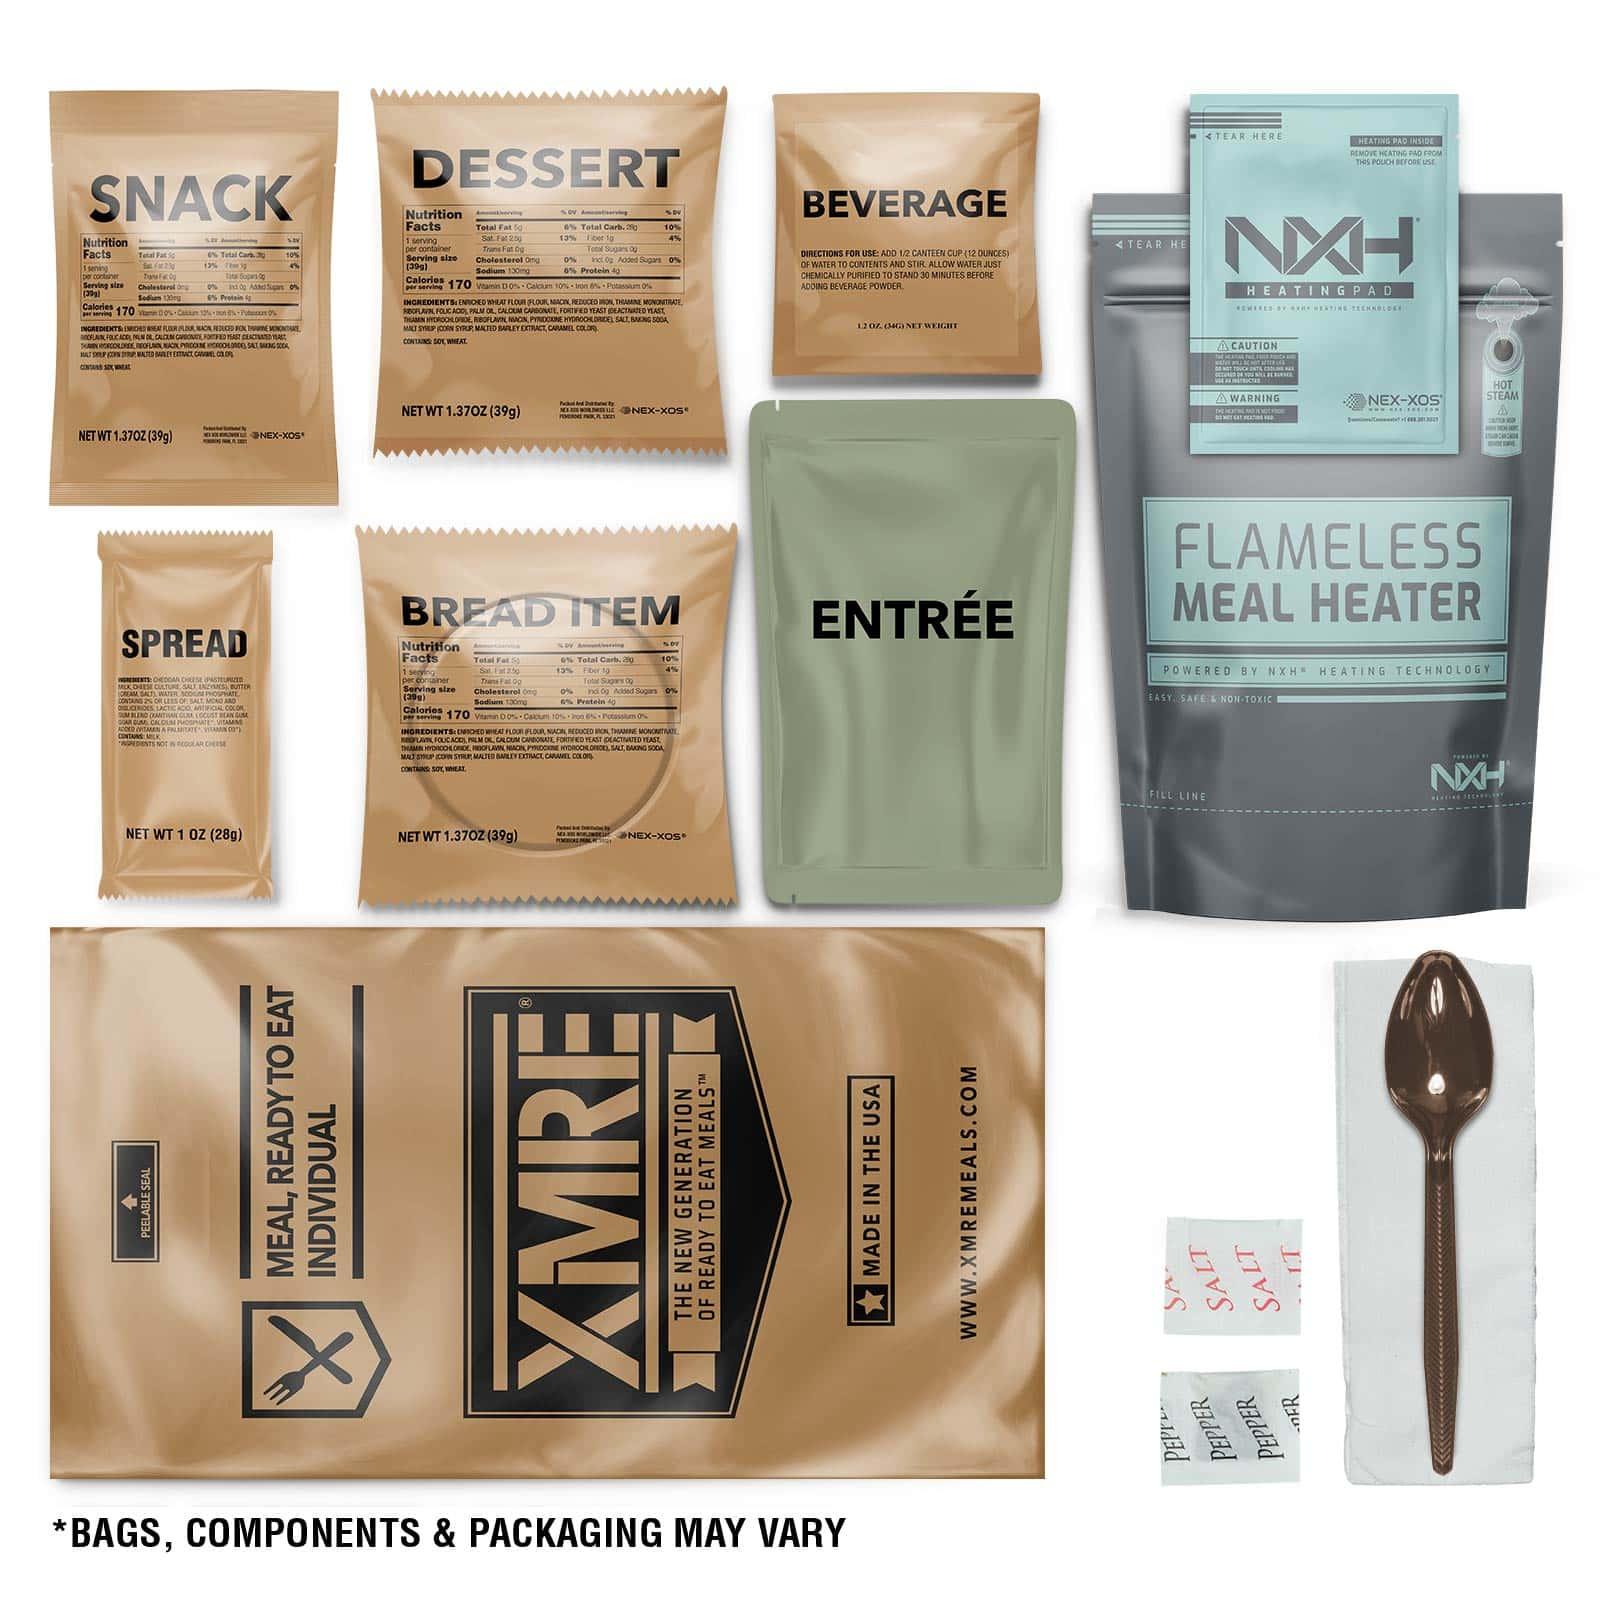 XMRE components